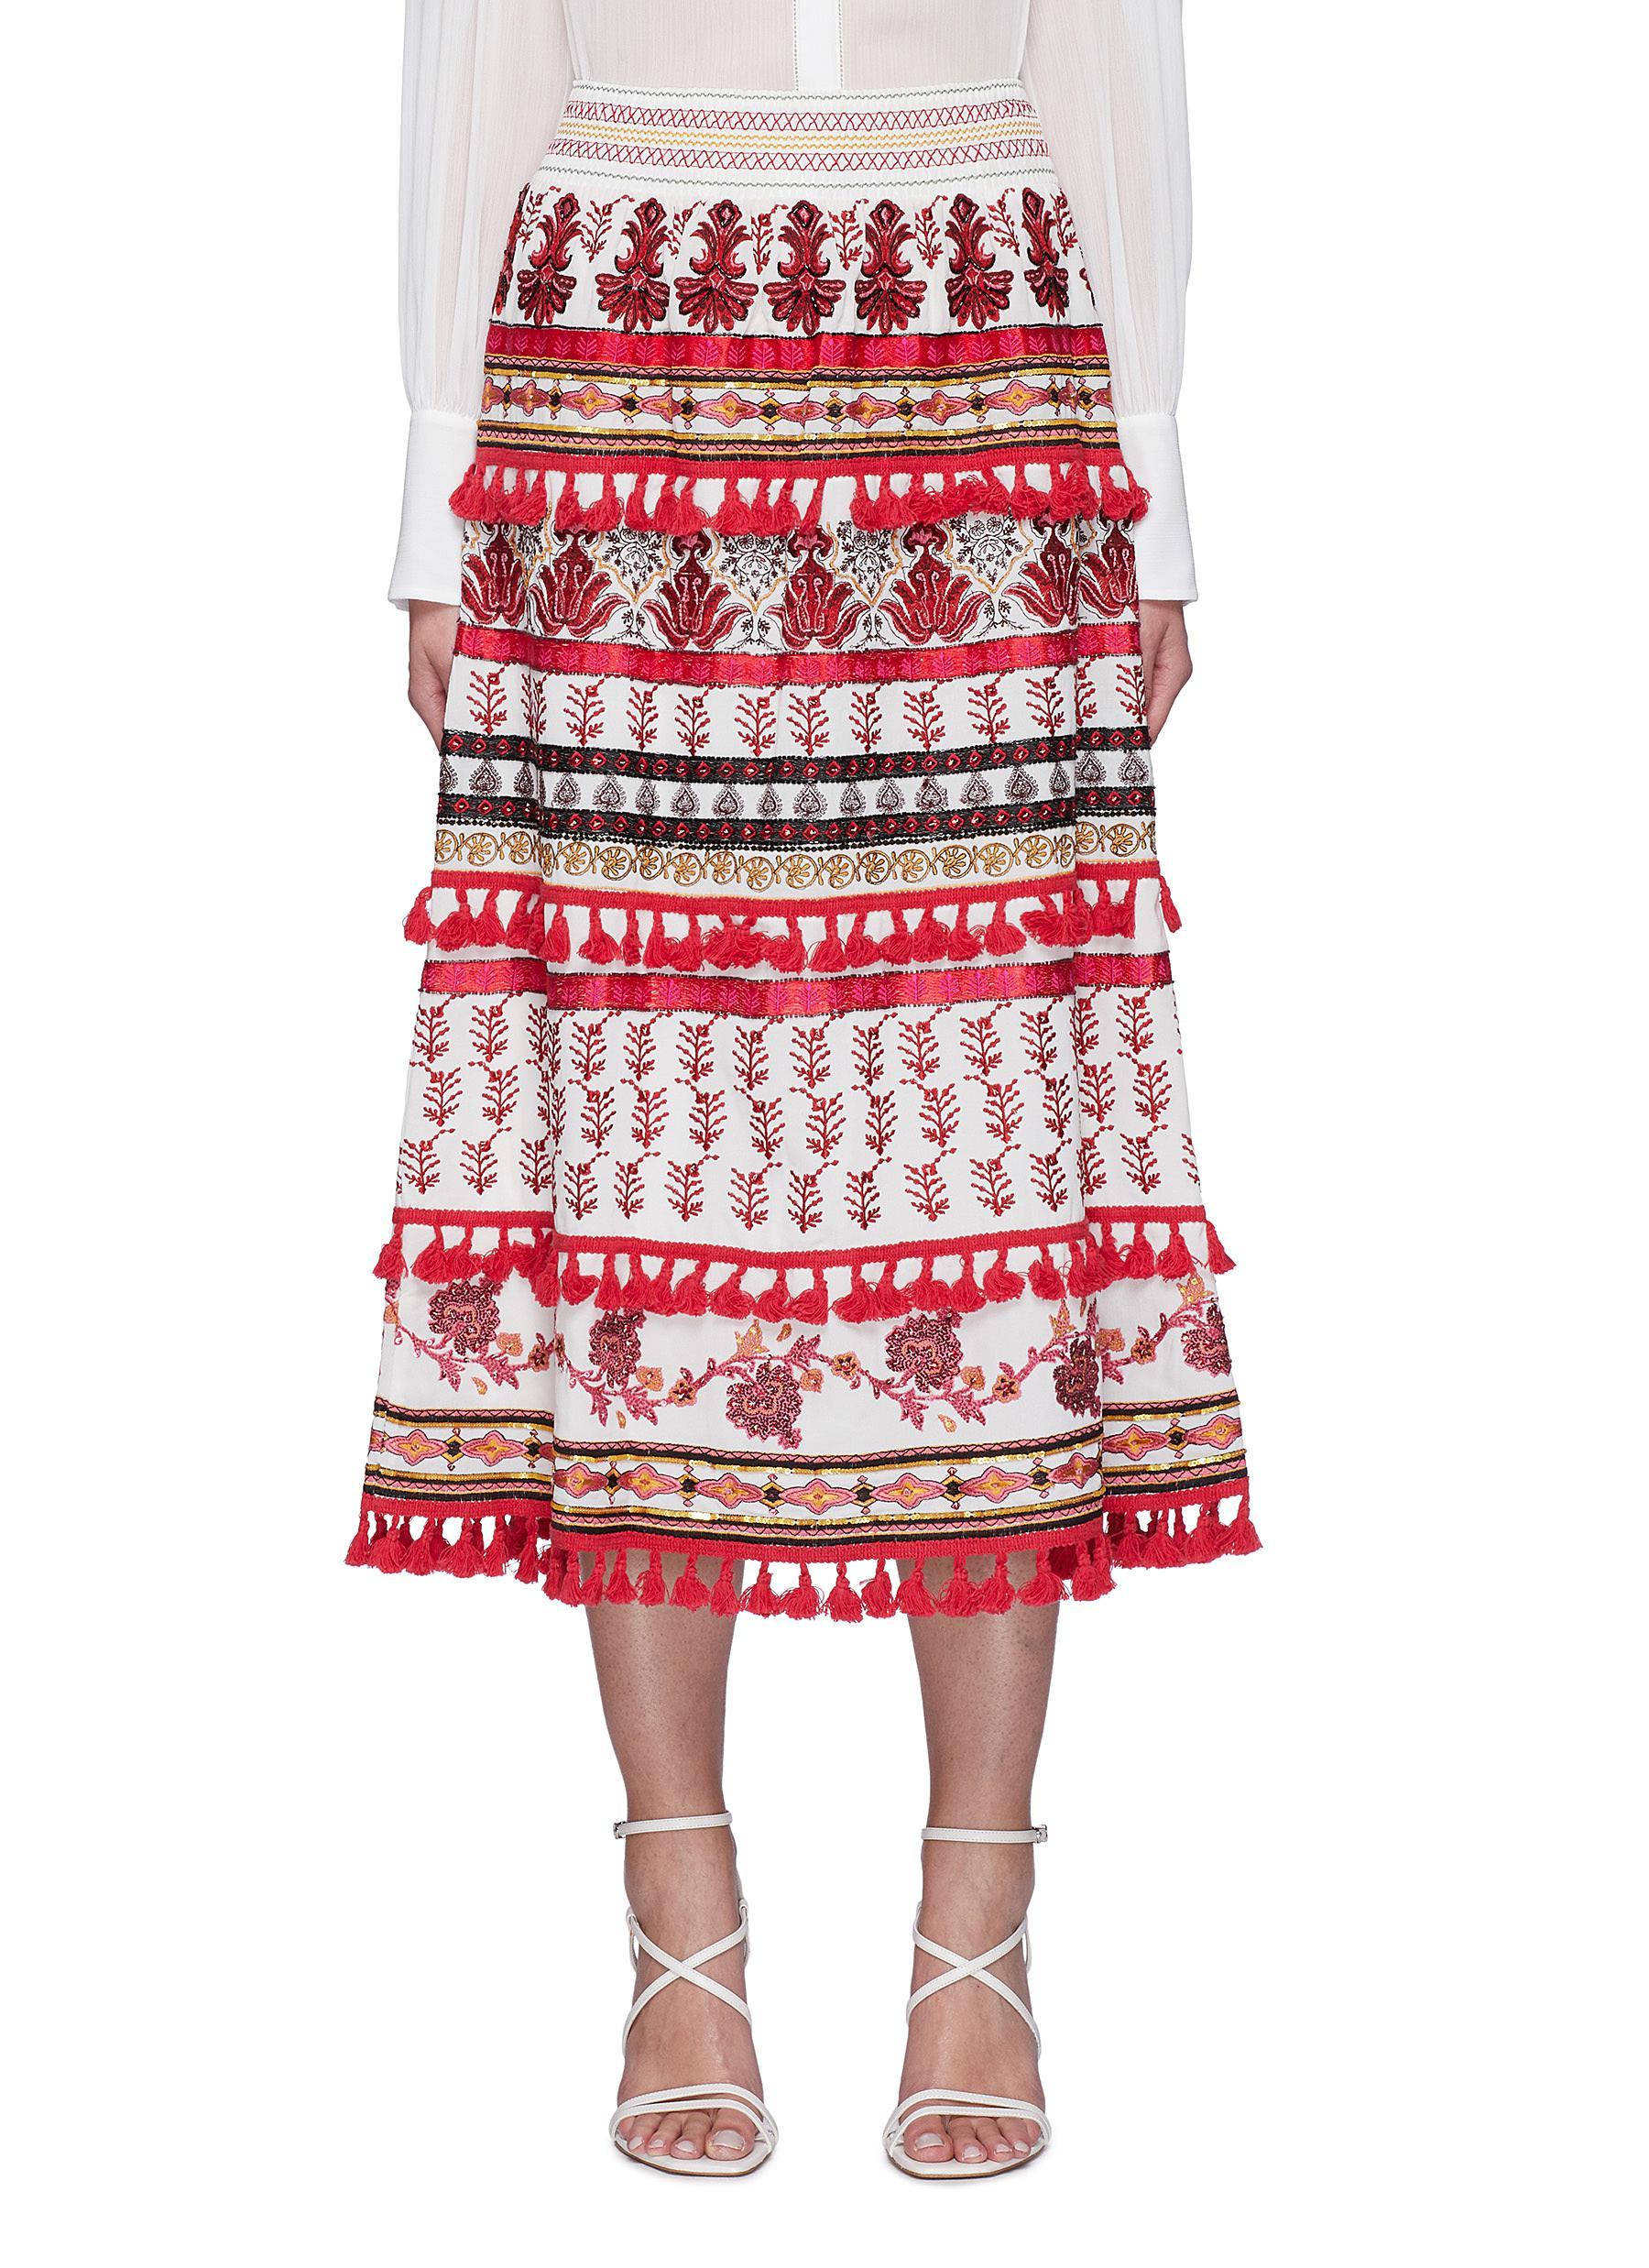 Cassie' embroidered tassel detail midi skirt - ALICE + OLIVIA - Modalova